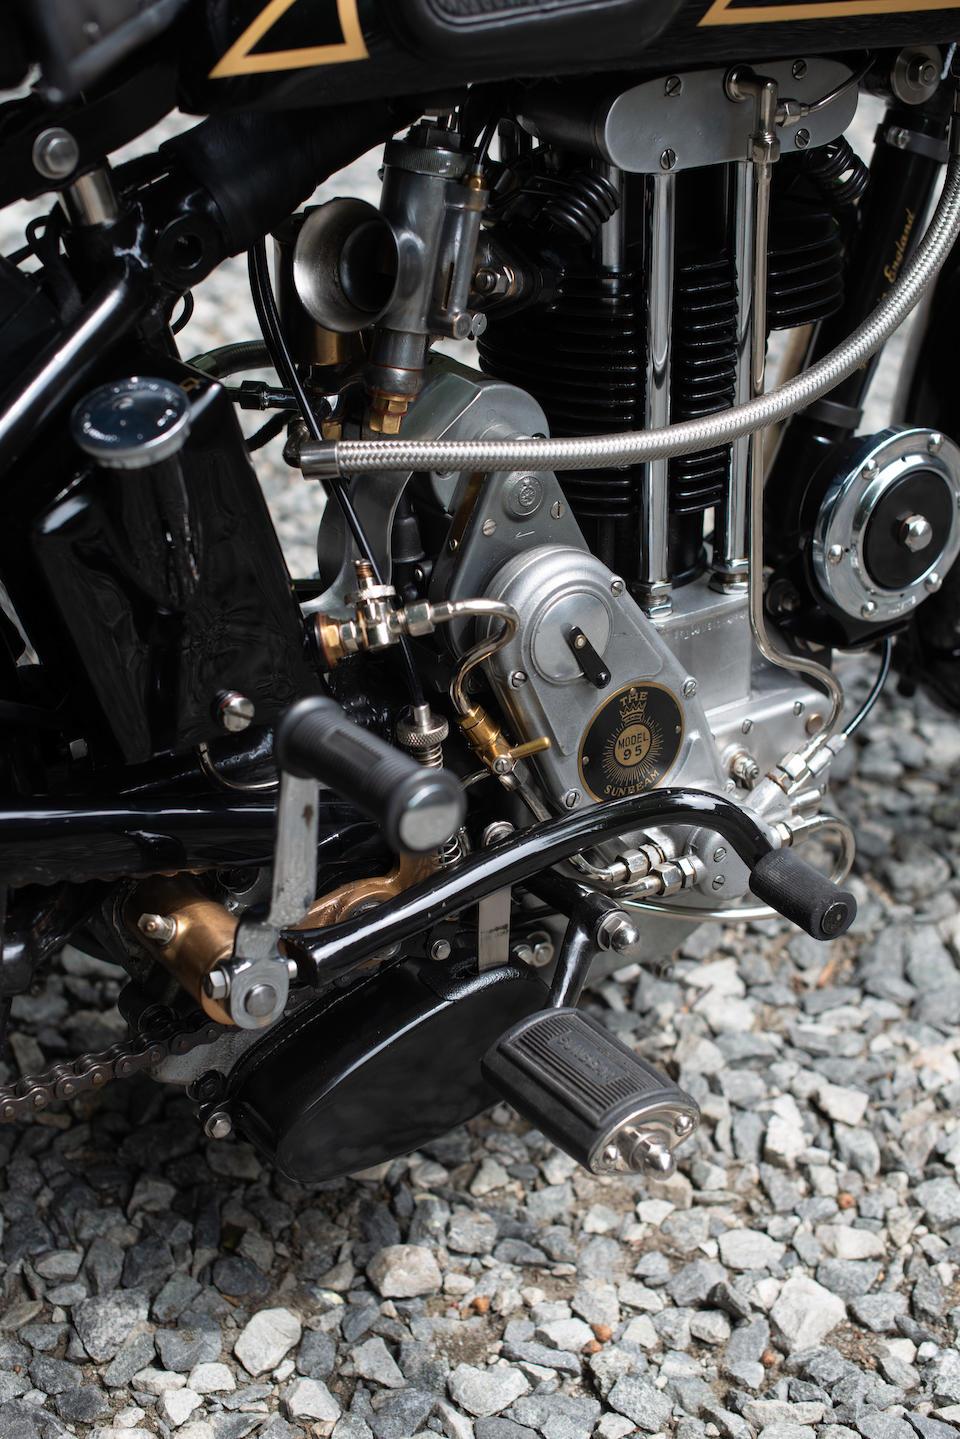 Ultra-rare OHV single, showing 211 miles since complete restoration,1934 Sunbeam 500cc 95L Frame no. 521.0-2641 Engine no. 95L.495.0.464